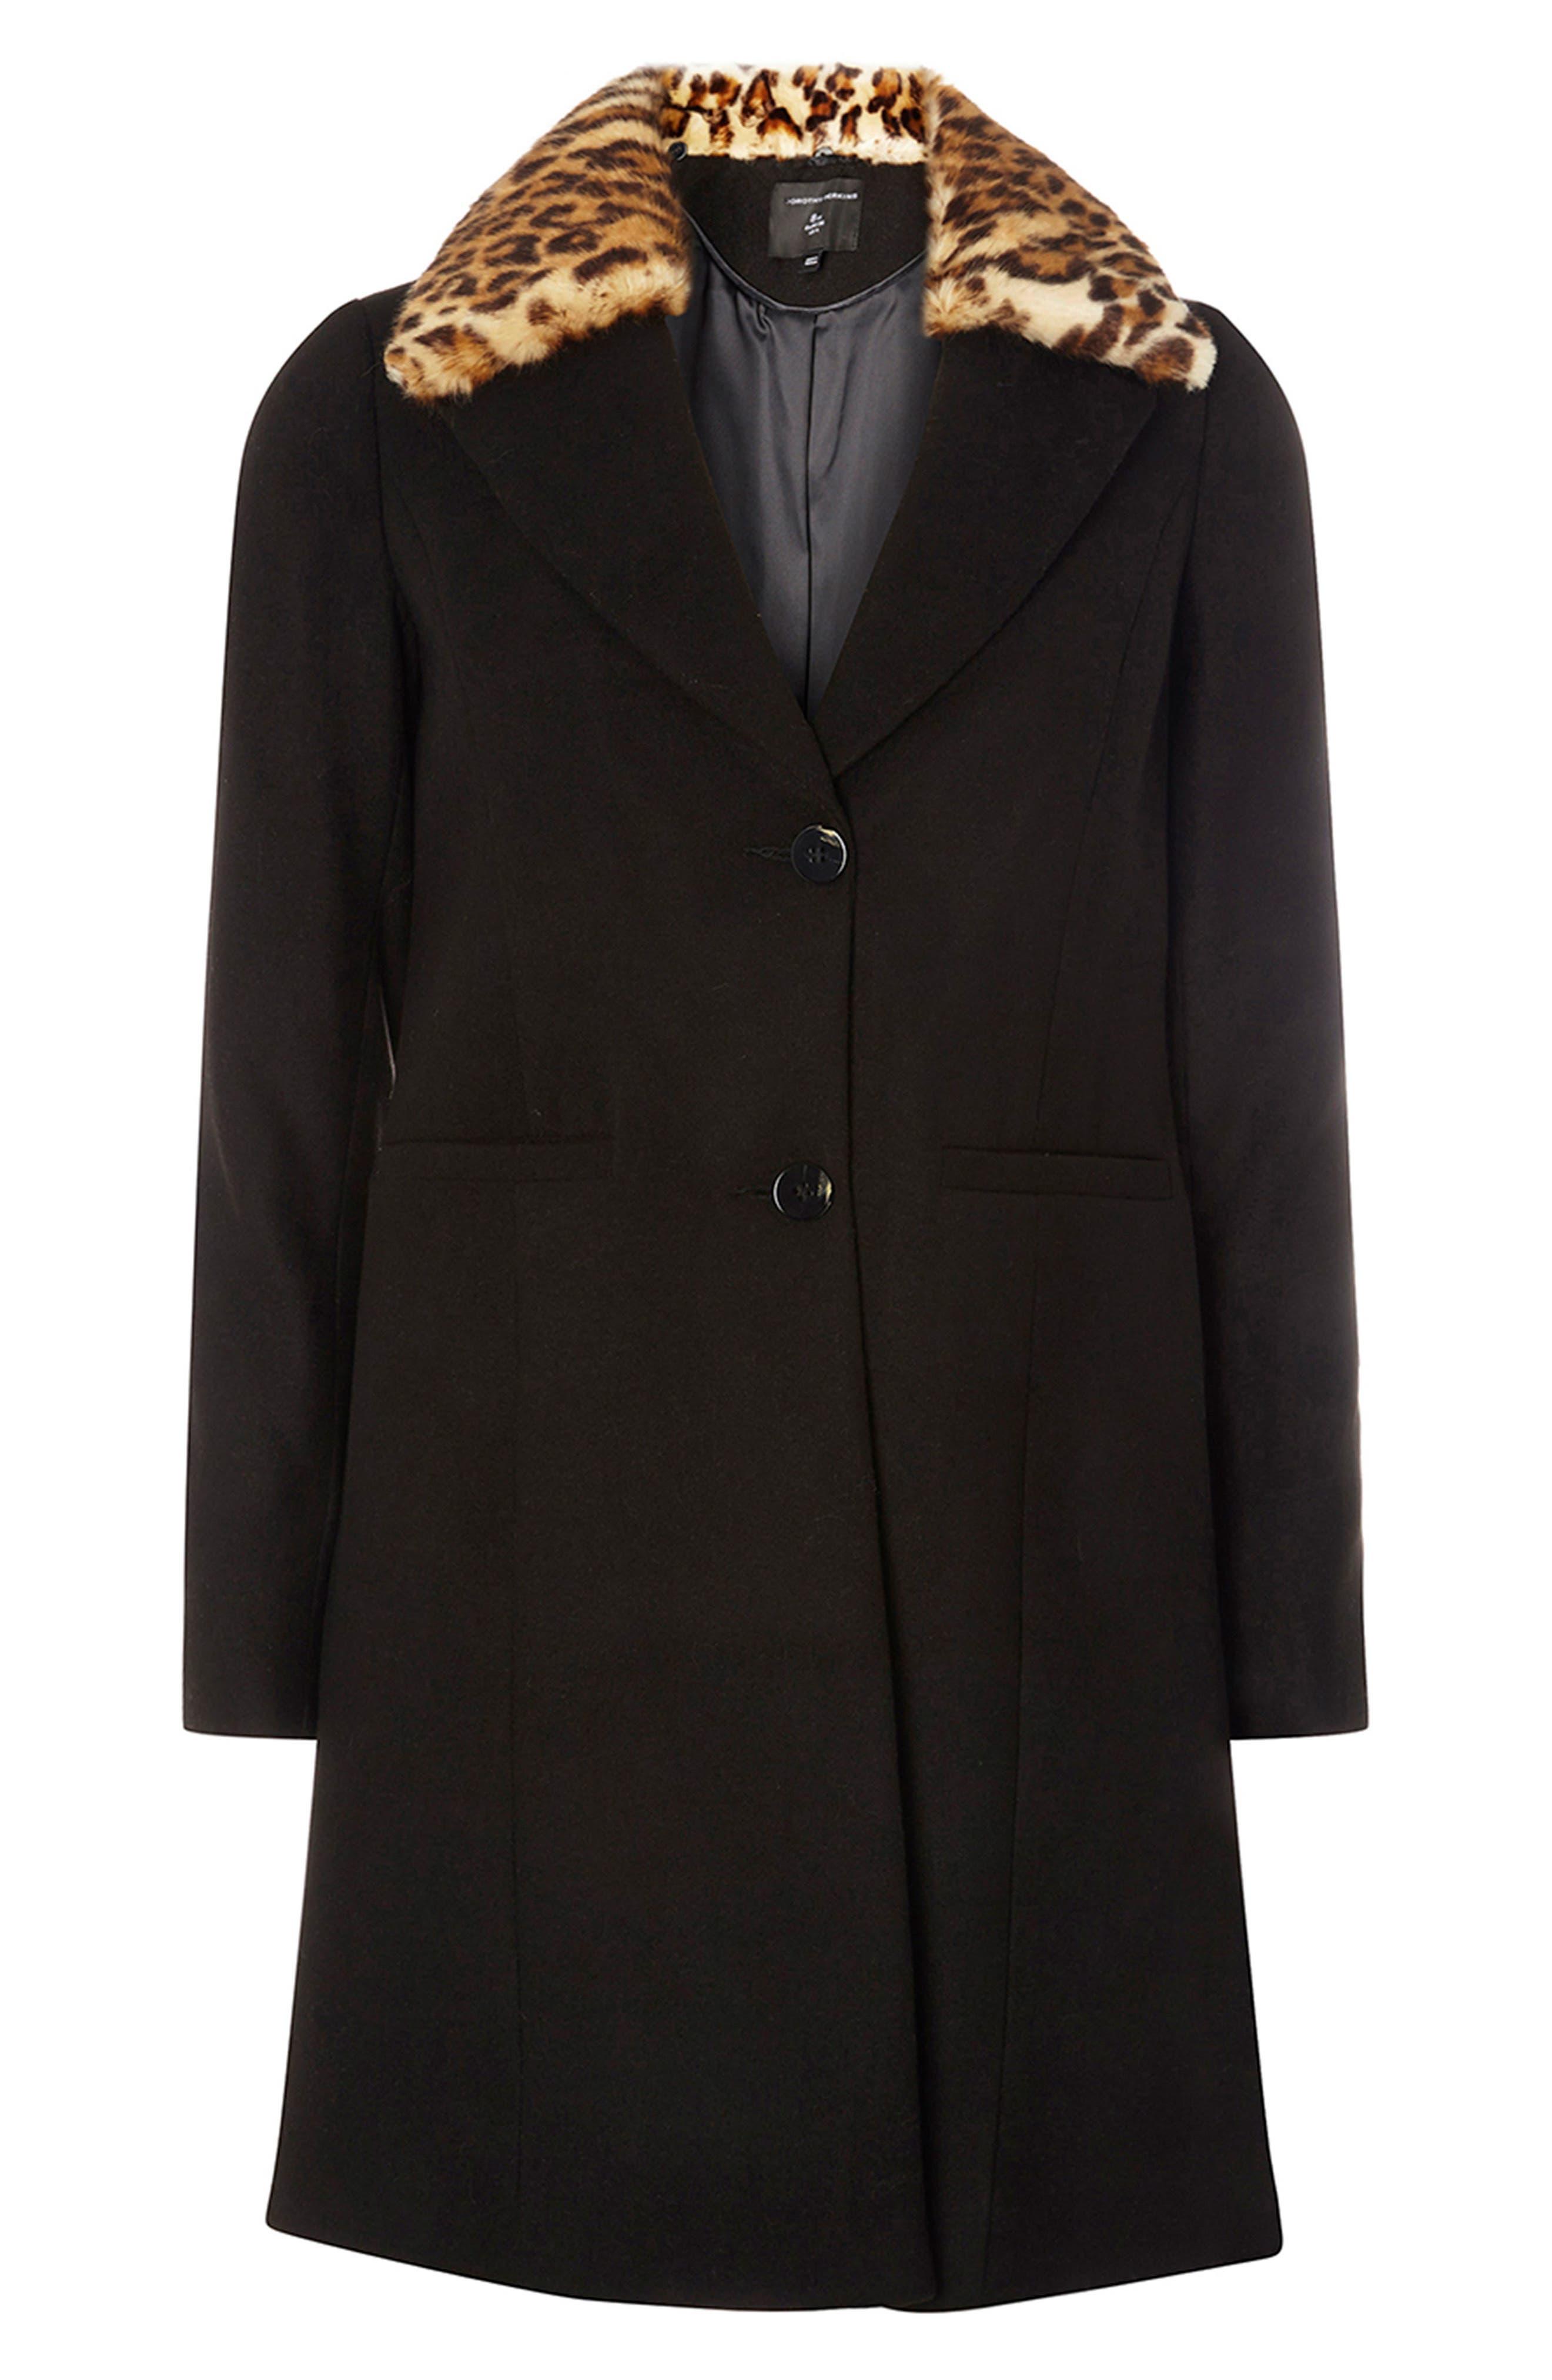 Coat with Faux Fur Collar,                             Alternate thumbnail 5, color,                             001